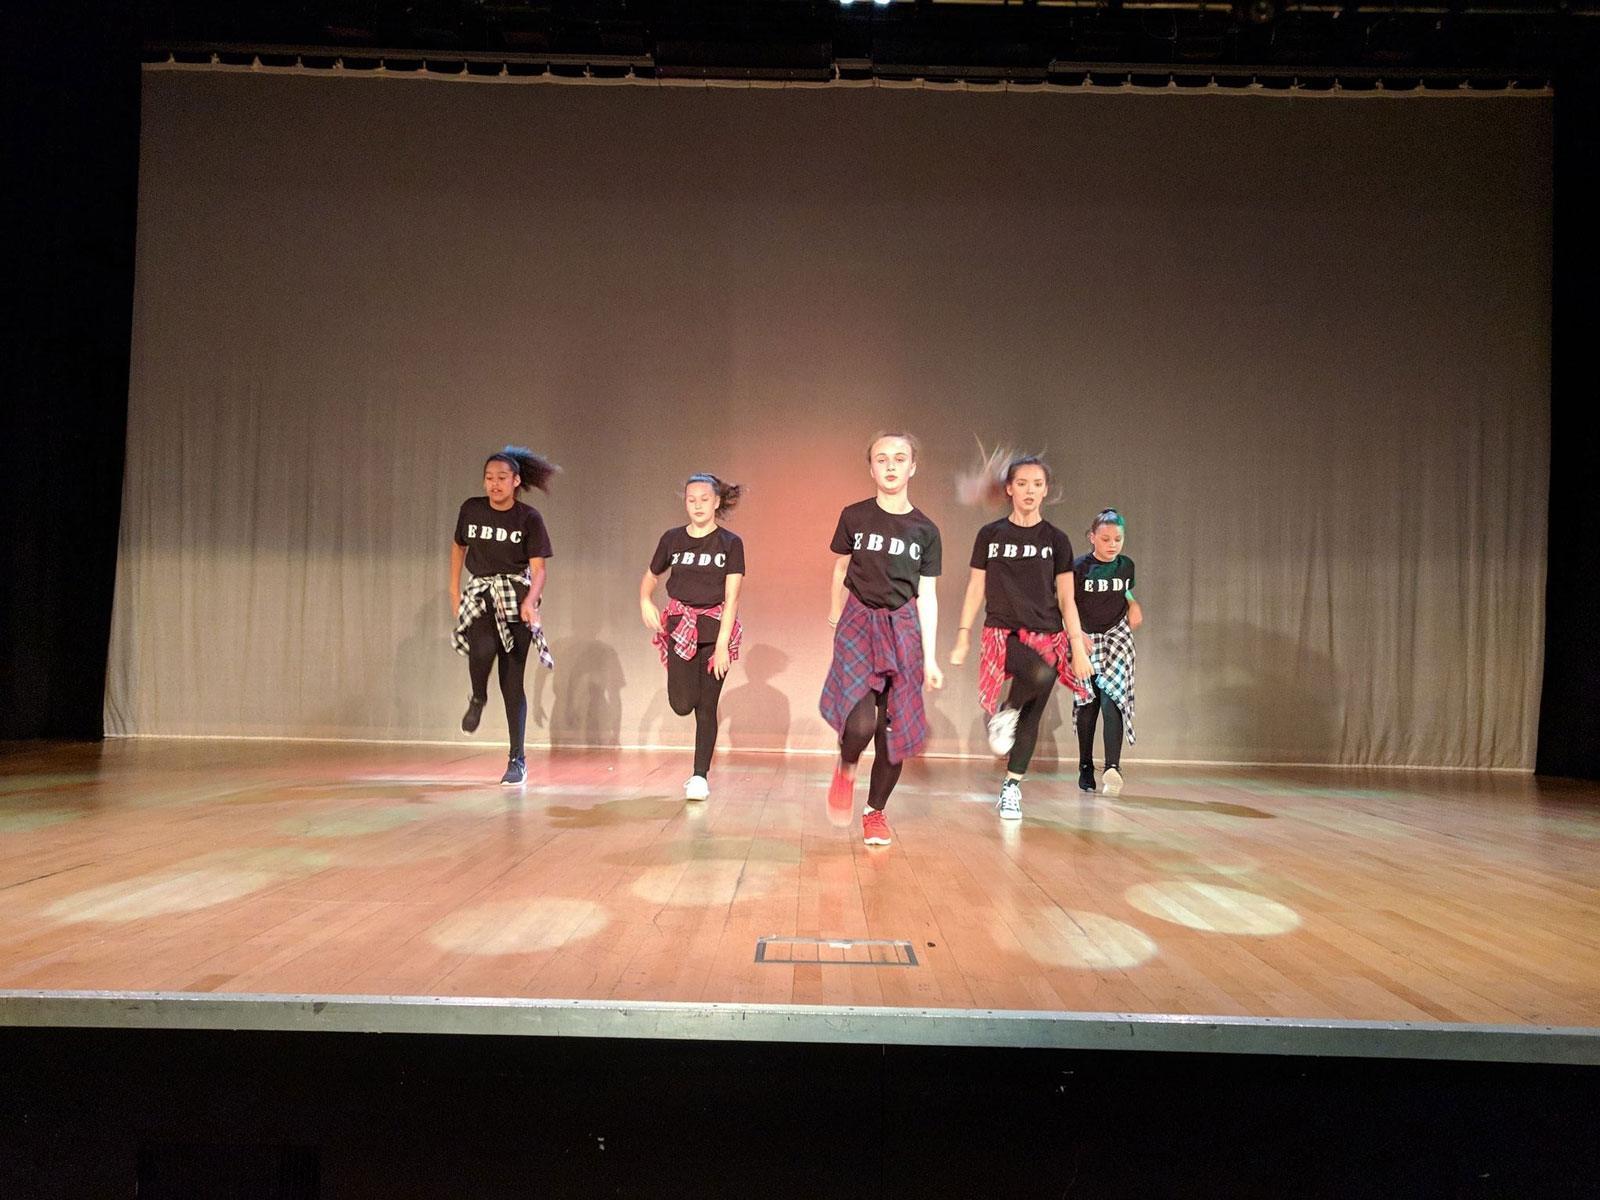 group dance stage show peterborough elizabeth boardman dance company ebdc